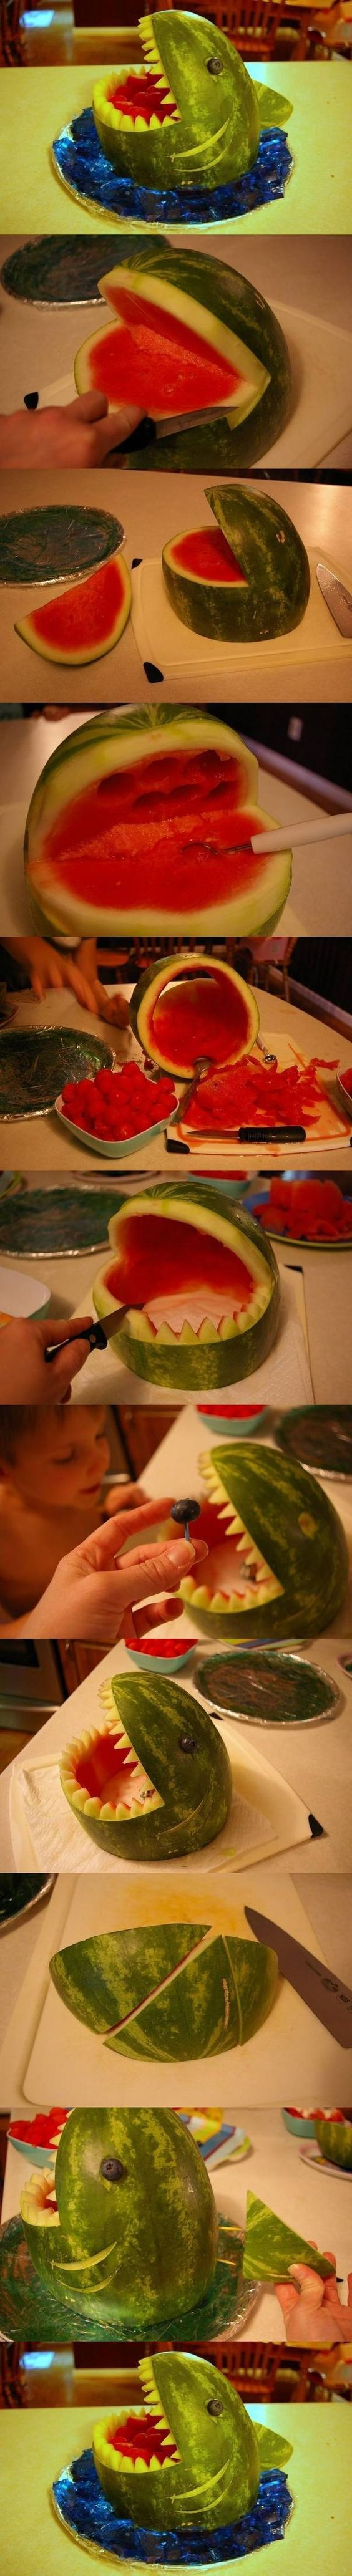 DIY Watermelon Shark #Food